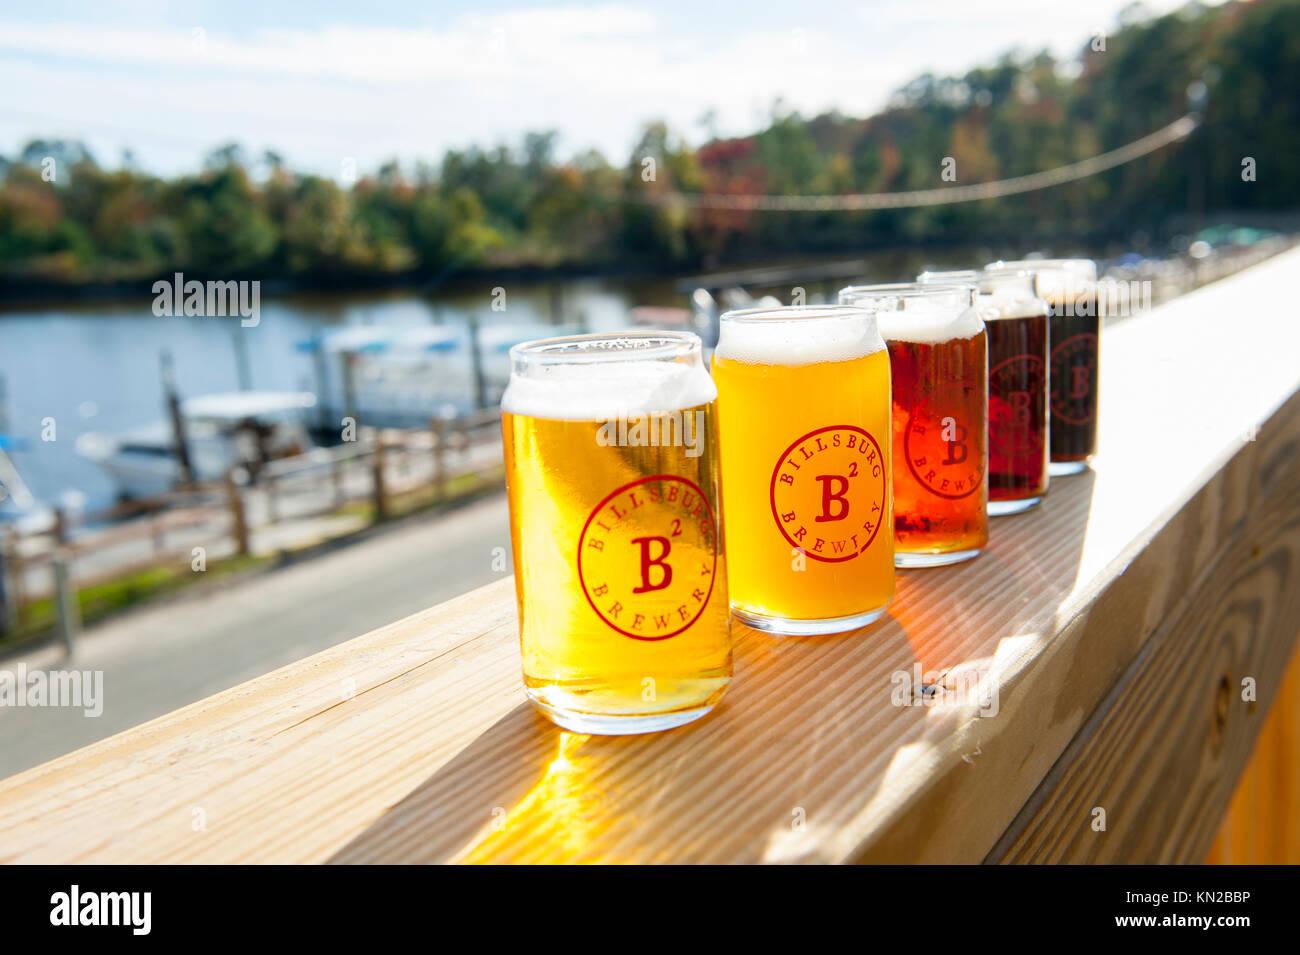 USA Virginia VA Jamestown Billsburg Brewery a flight of beers for tasting at the Jamestown Yacht Basin micro brew - Stock Image